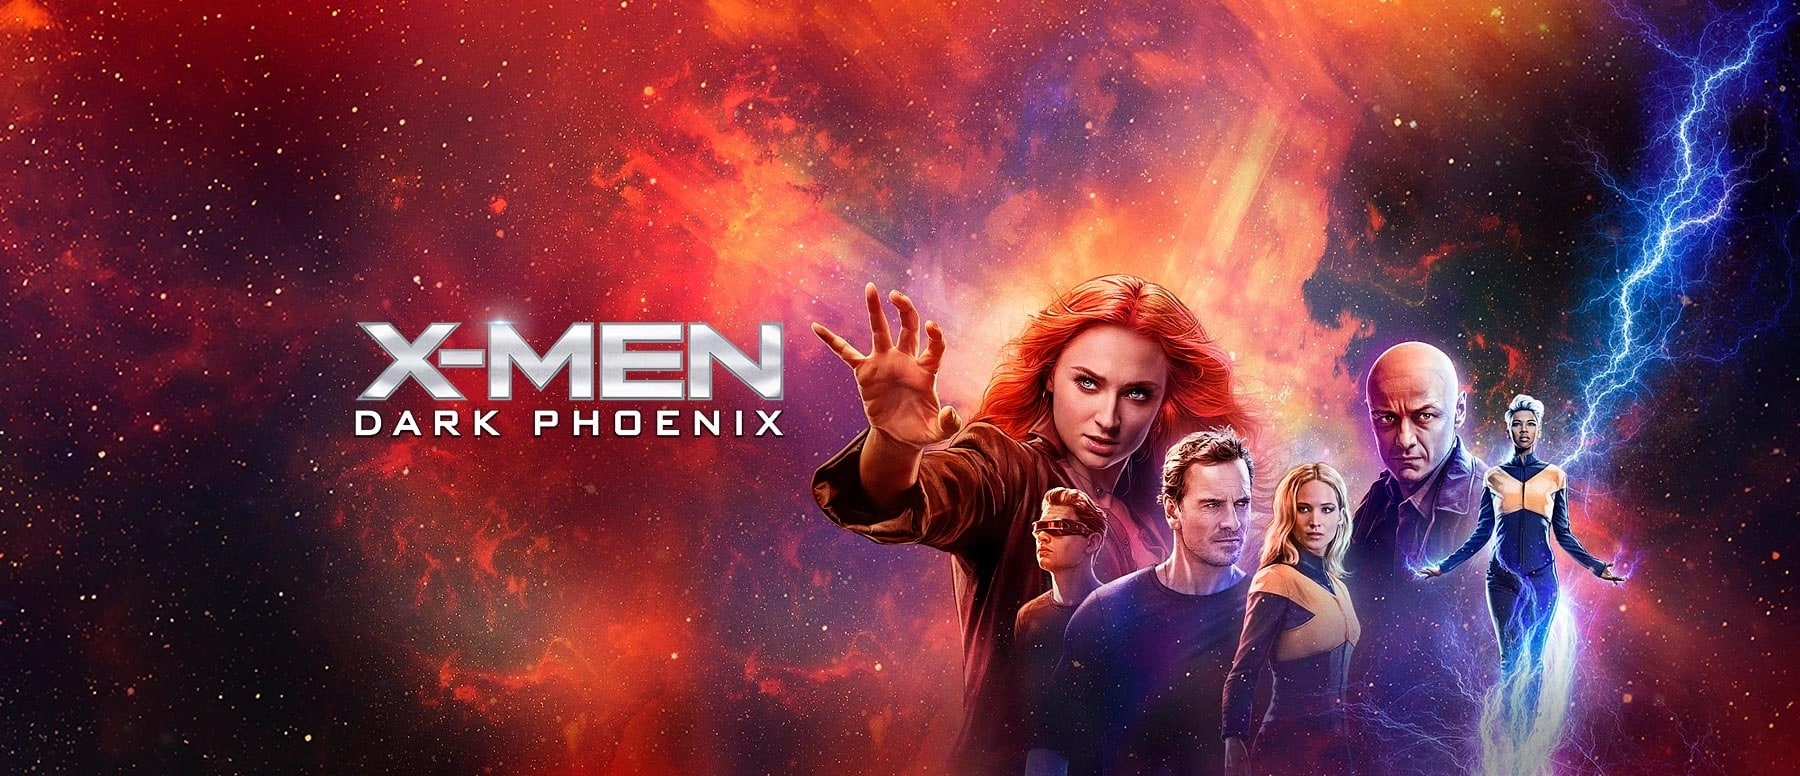 Dark Phoenix 20th Century Studios